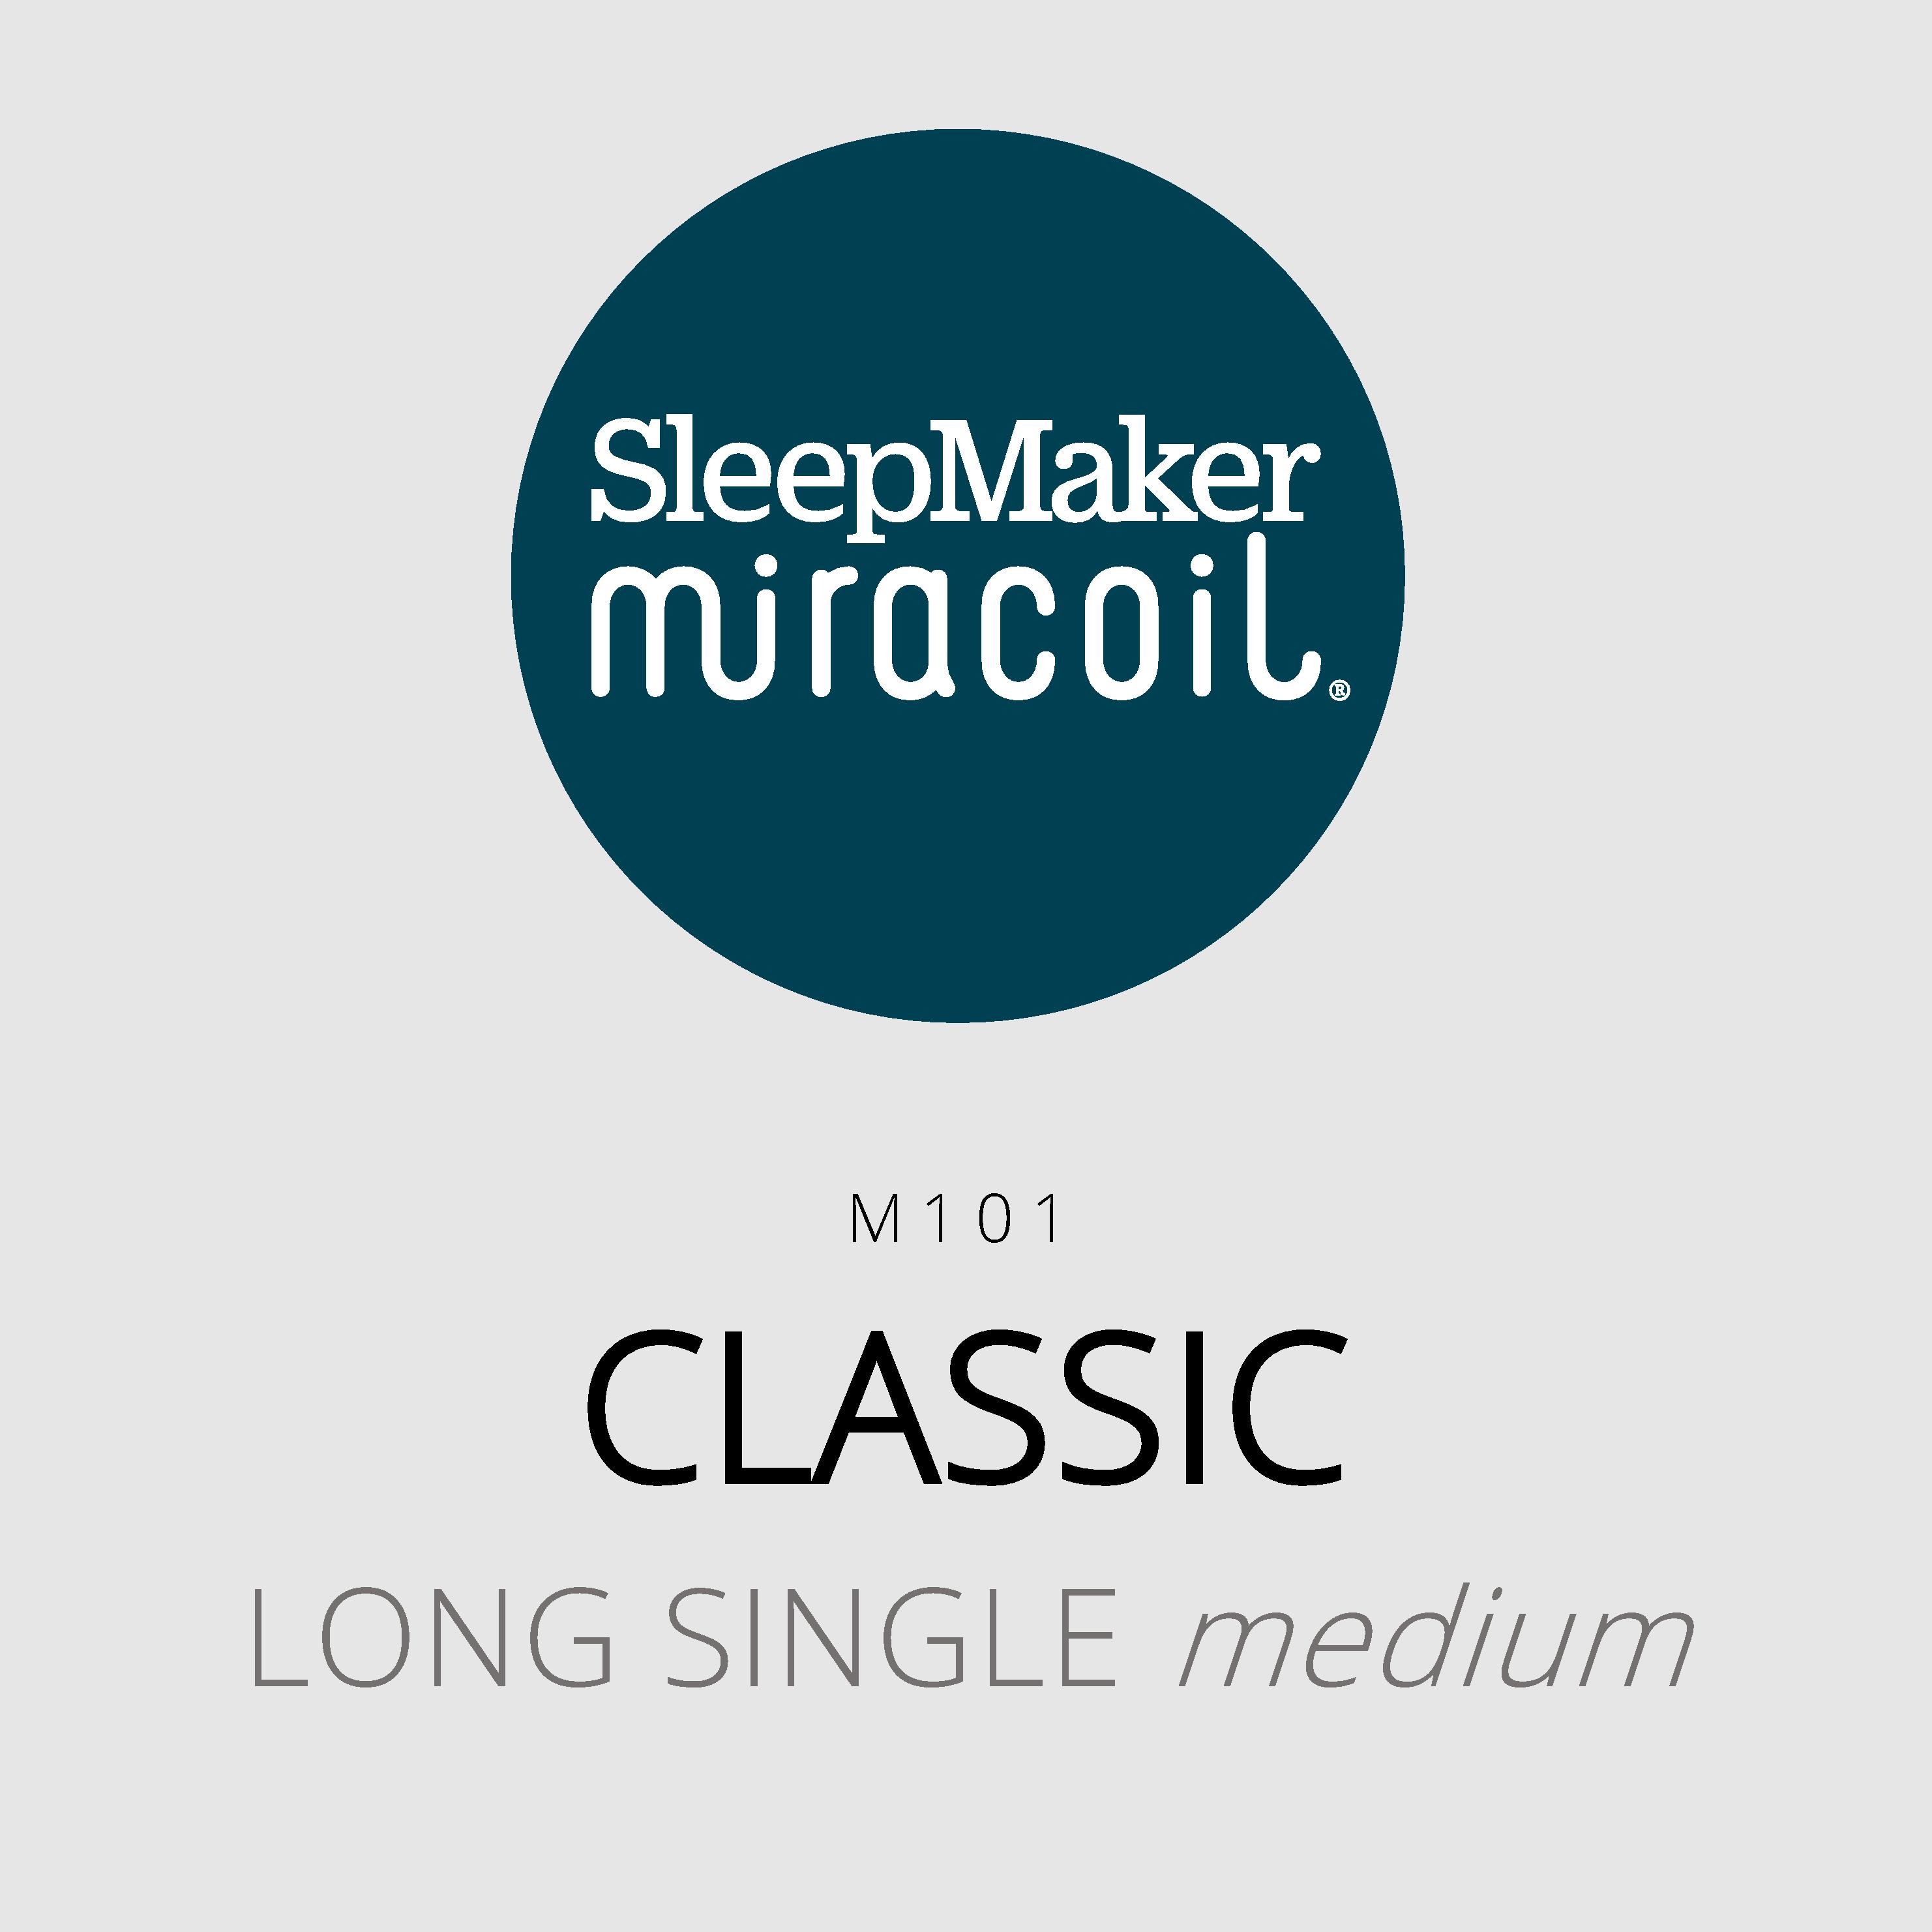 SleepMaker Miracoil – Classic – M101 – Long Single Medium Mattress